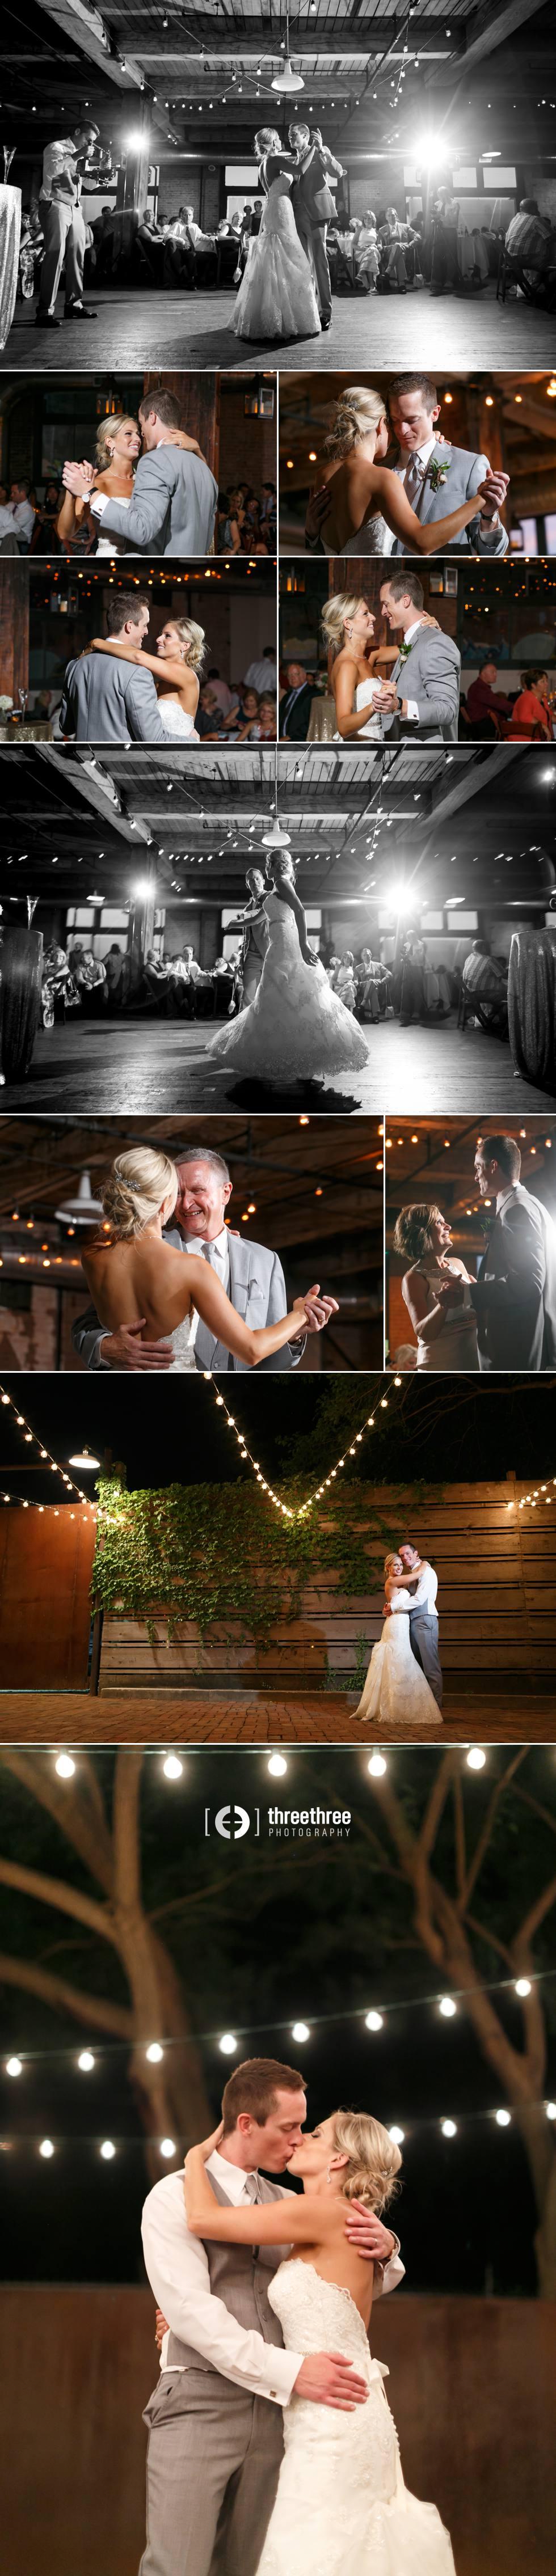 Natalie_AJ_wedding 16